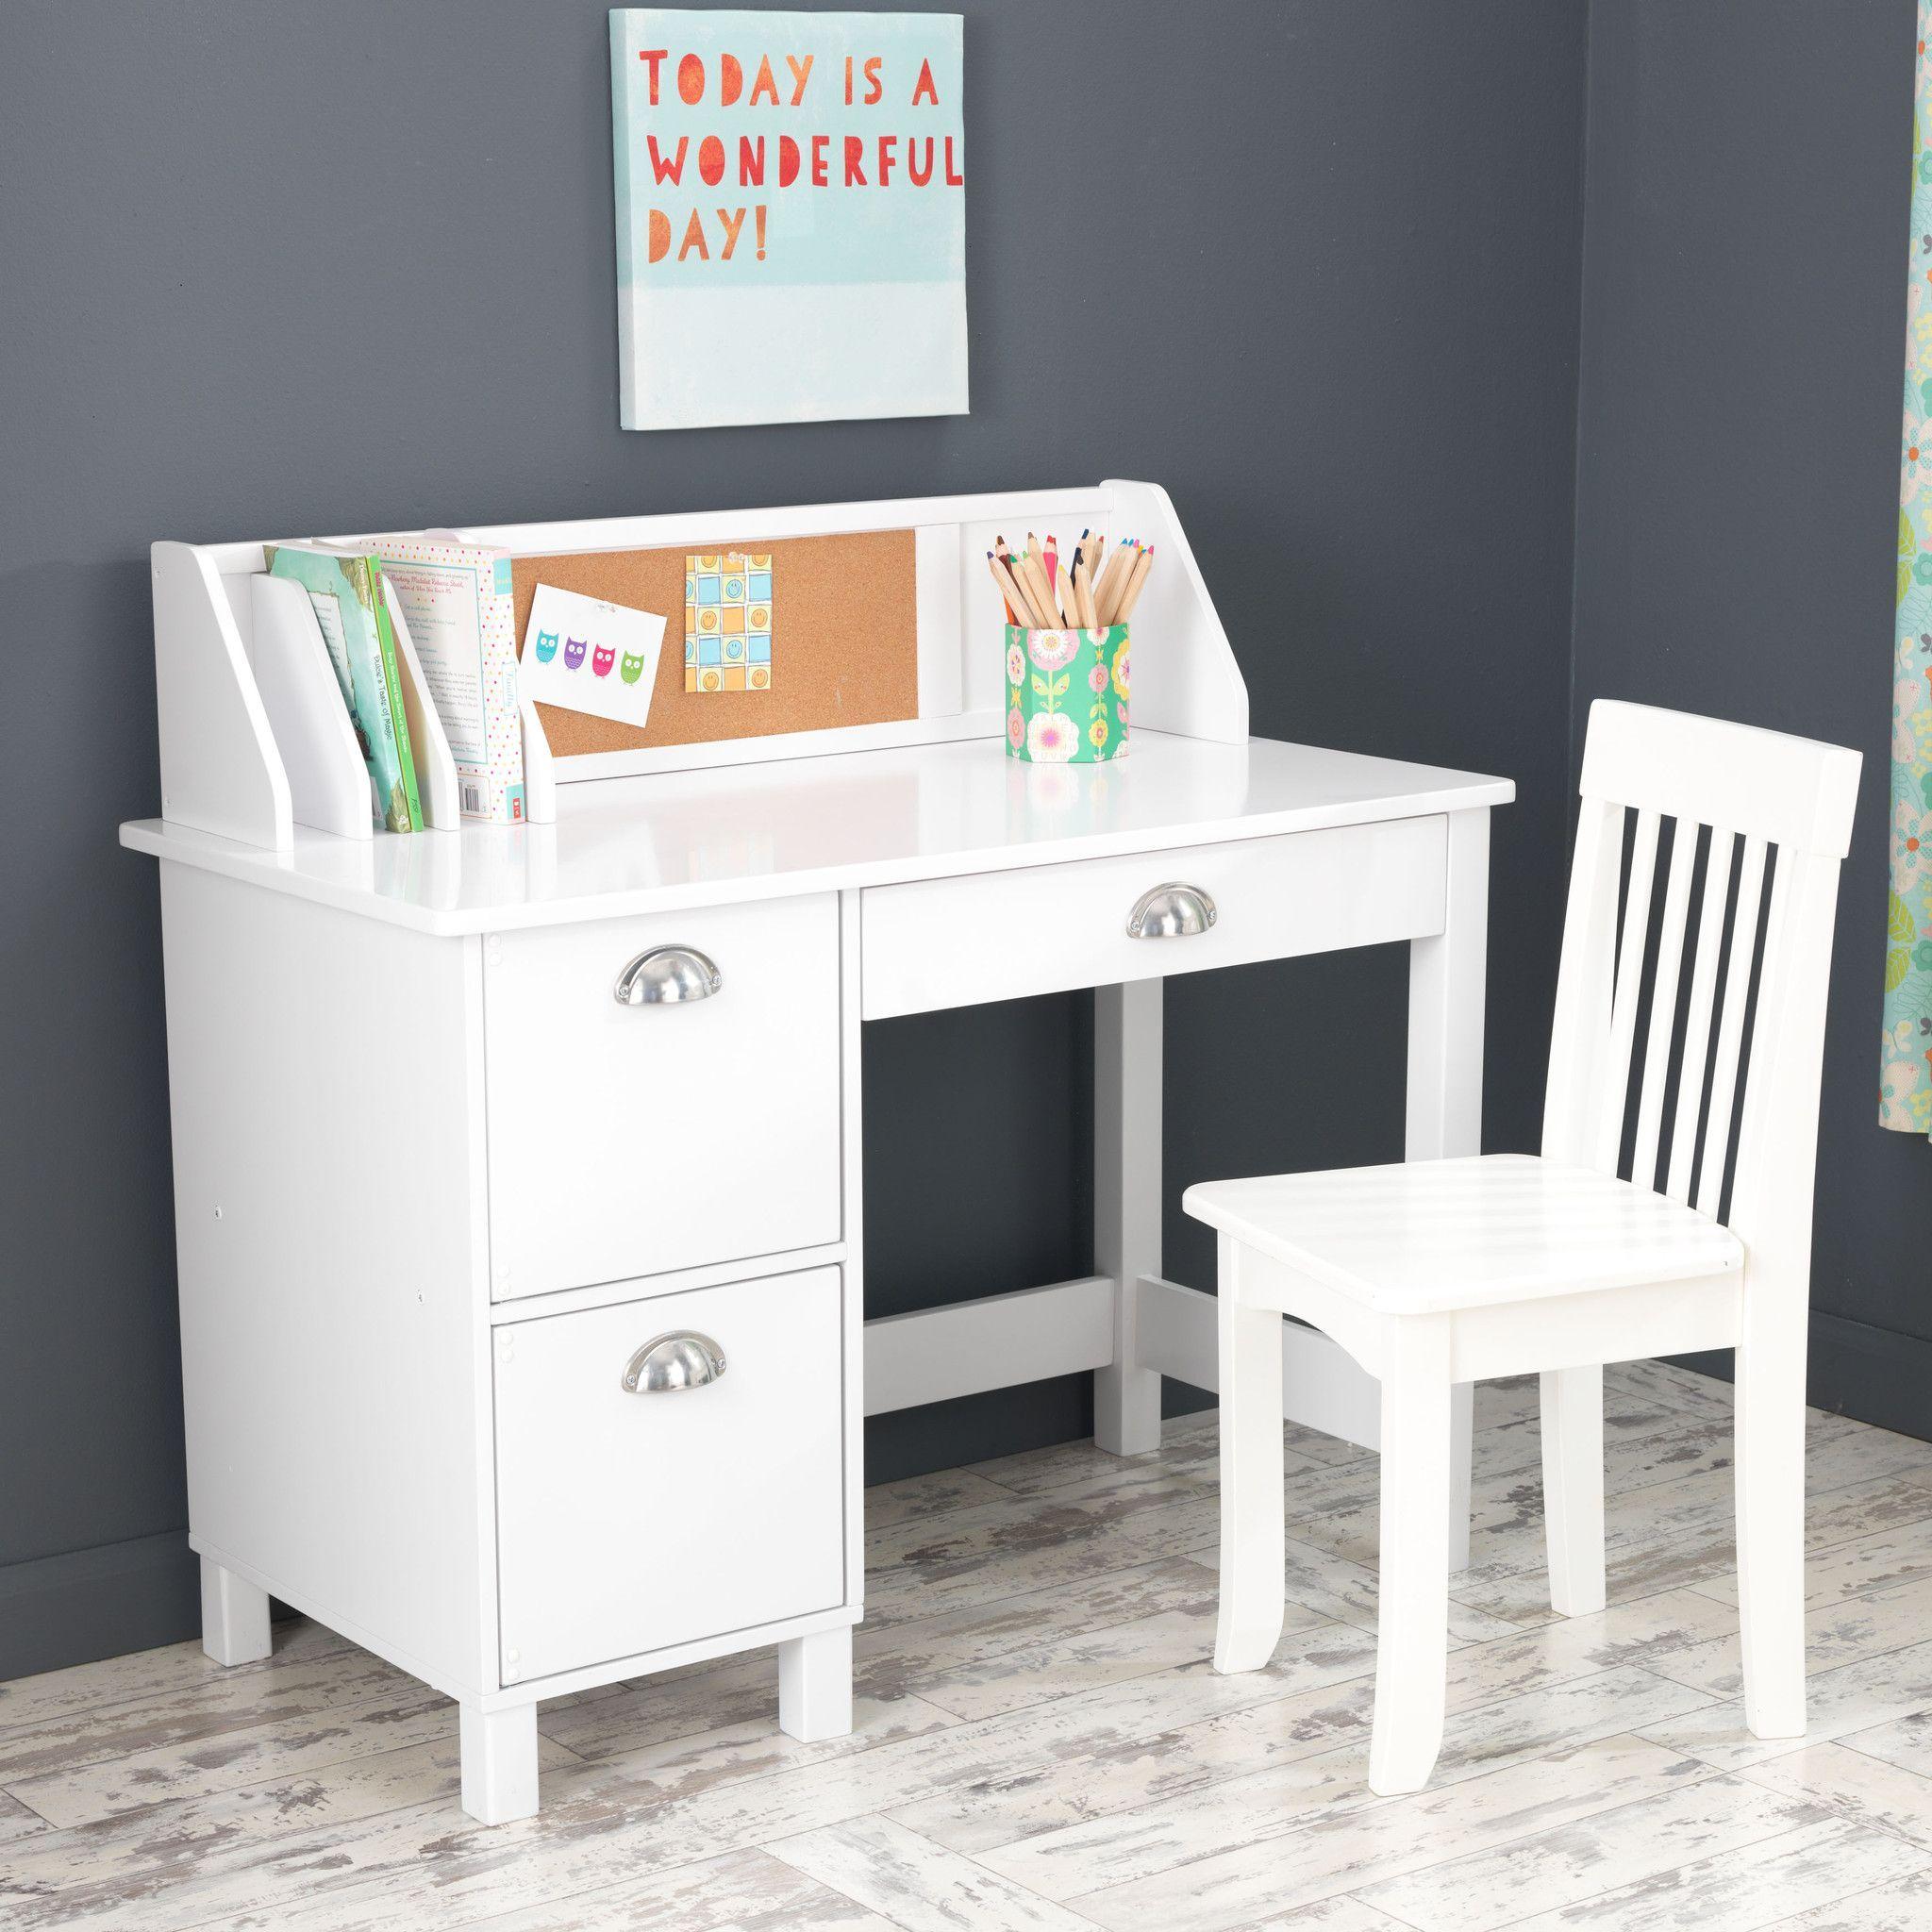 KidKraft Study Desk with Drawers White $179 The Kidkraft